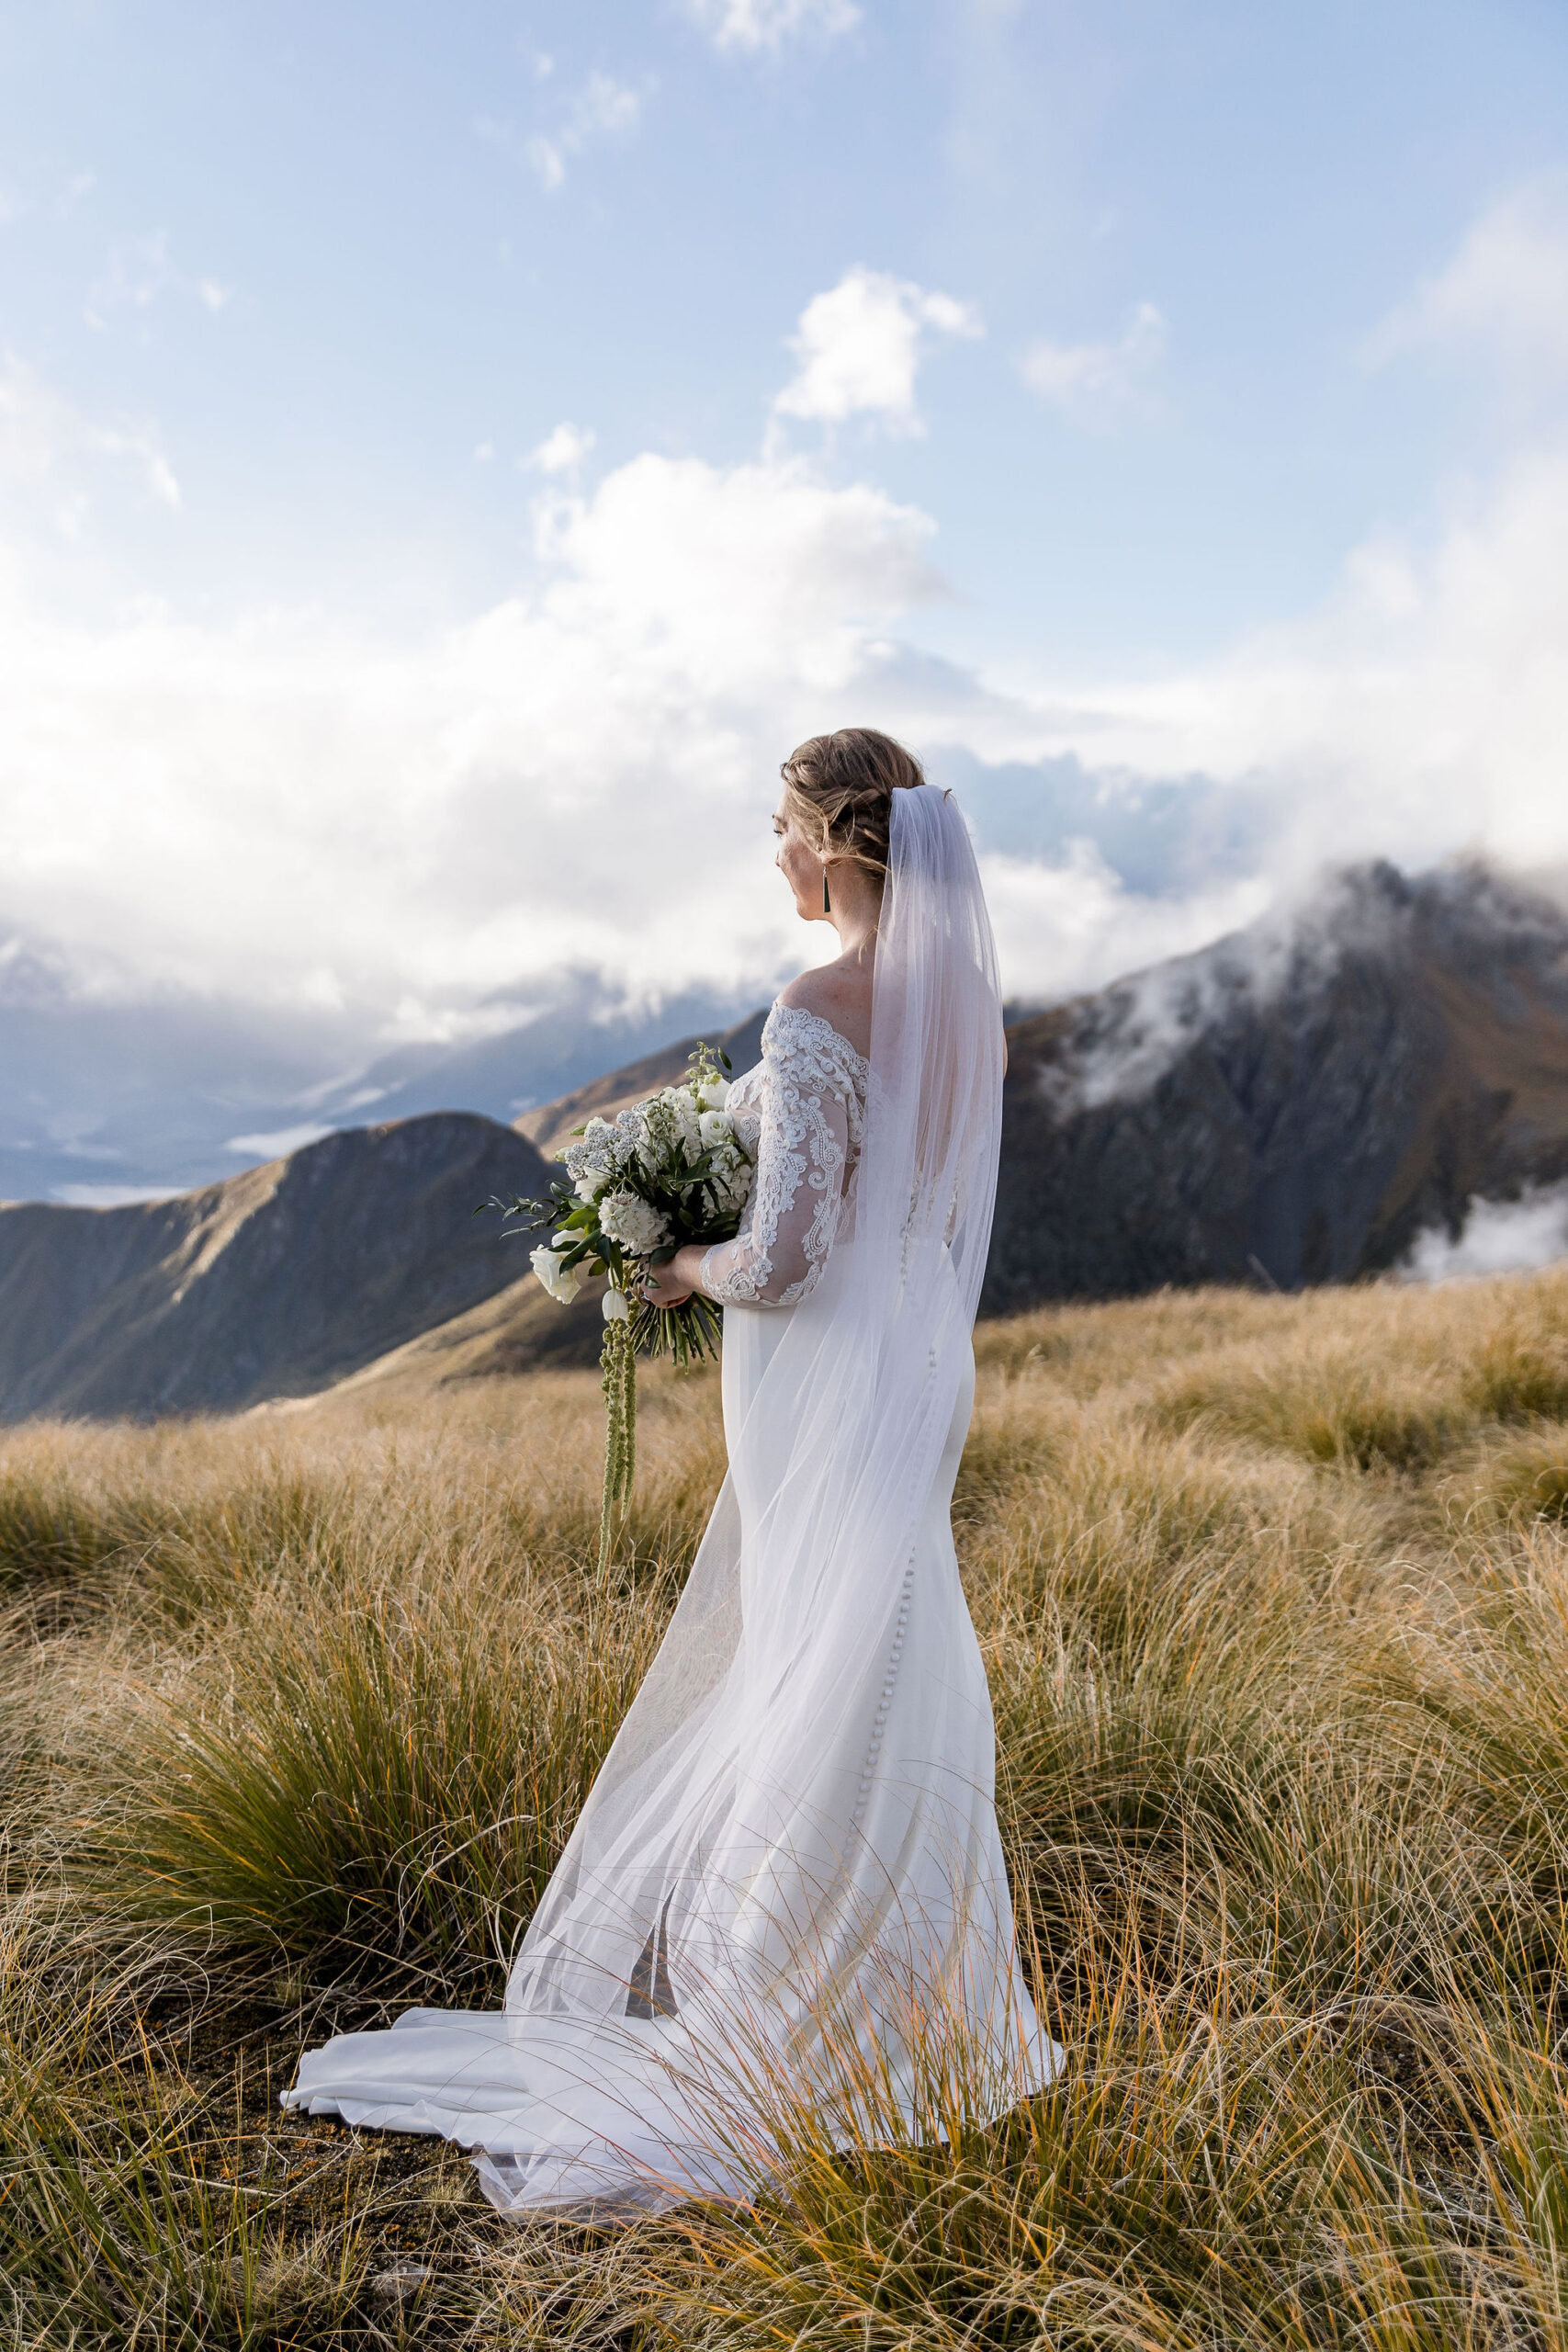 Heli Glenorchy Elopement - Susan Miller Photography